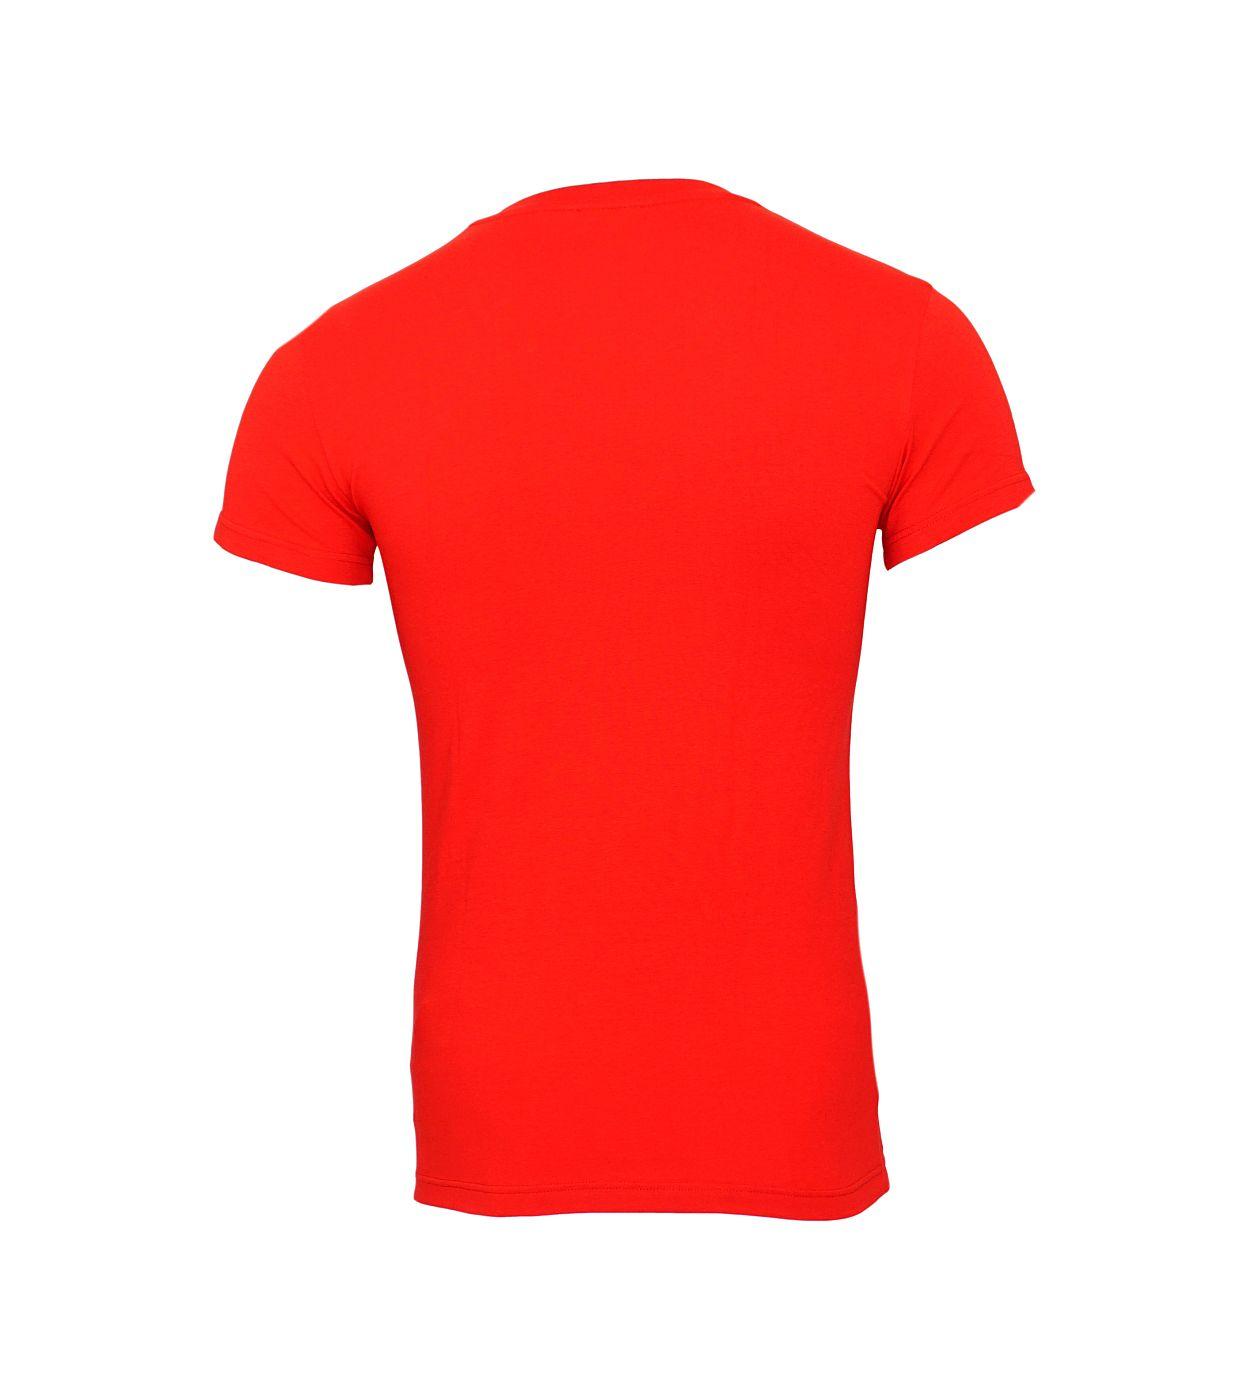 Emporio Armani T-Shirts V-Ausschnitt 110810 8A516 13174 RUBINO SH18-EAT2